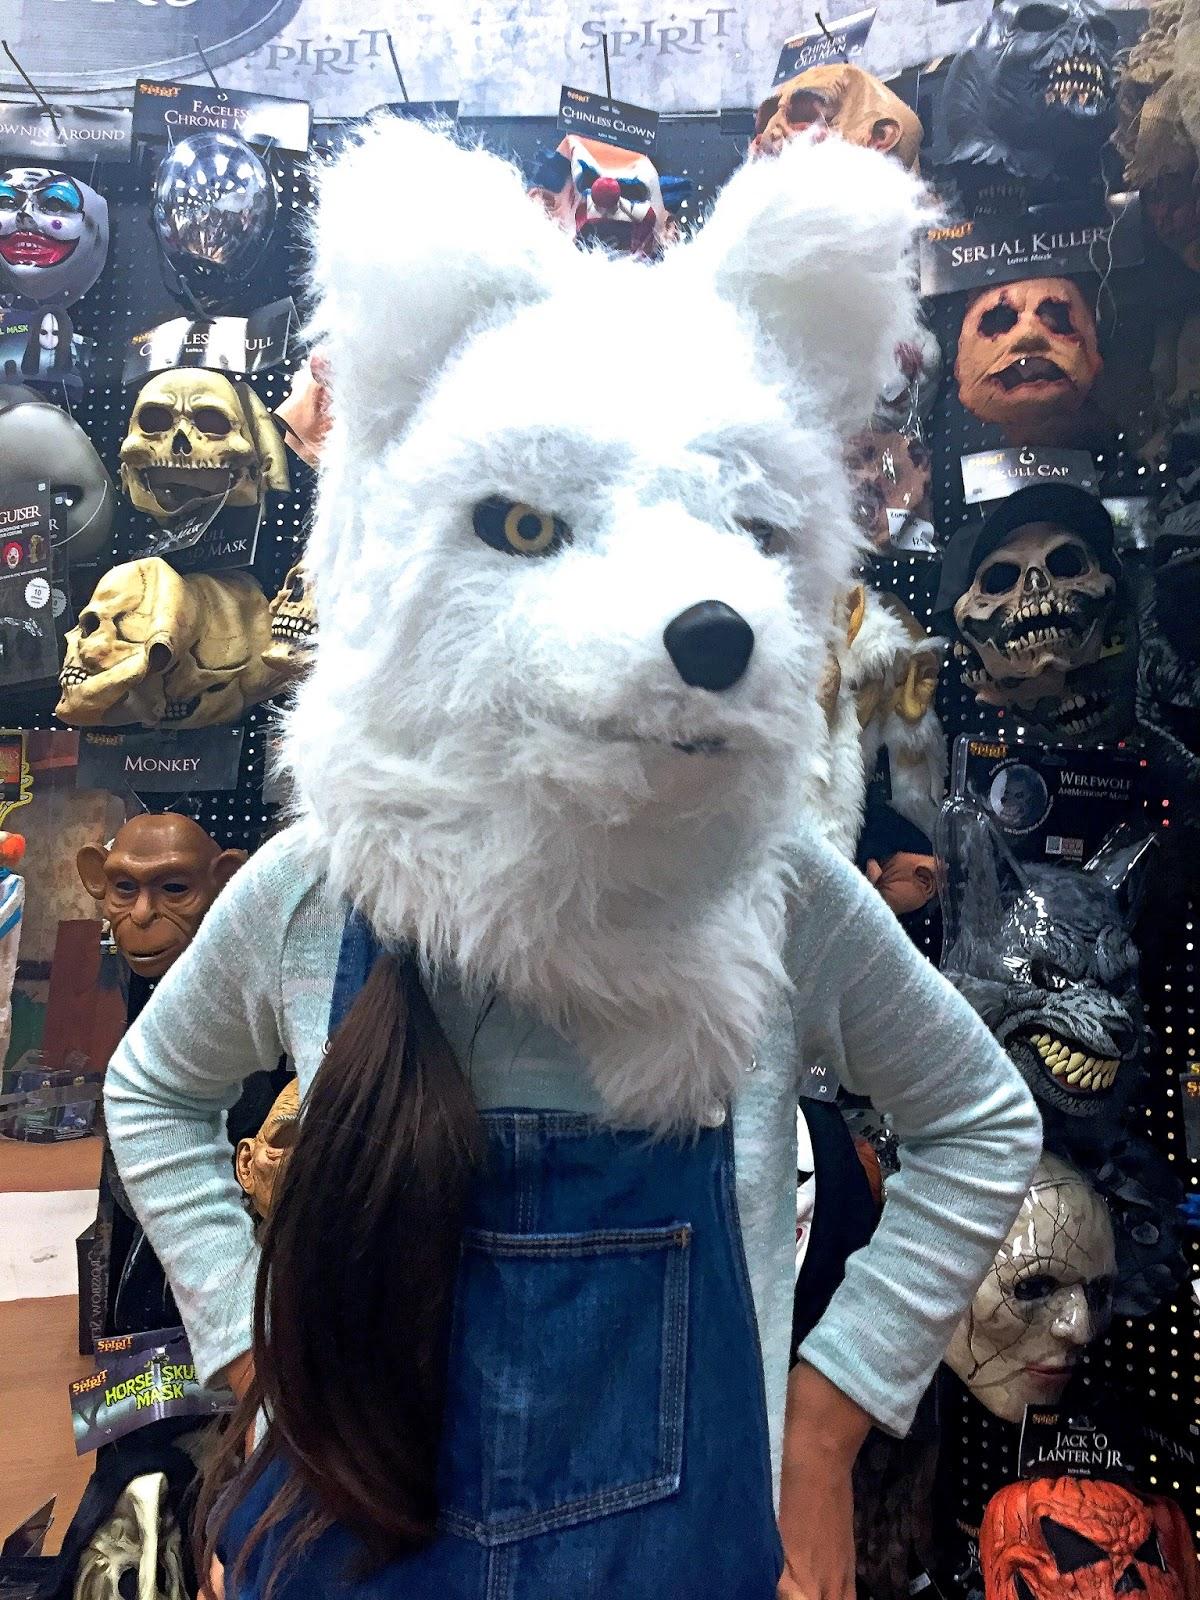 Spirit Halloween Clown Costumes Kids.Maria S Space Fun With My Kids At Spirit Halloween Store